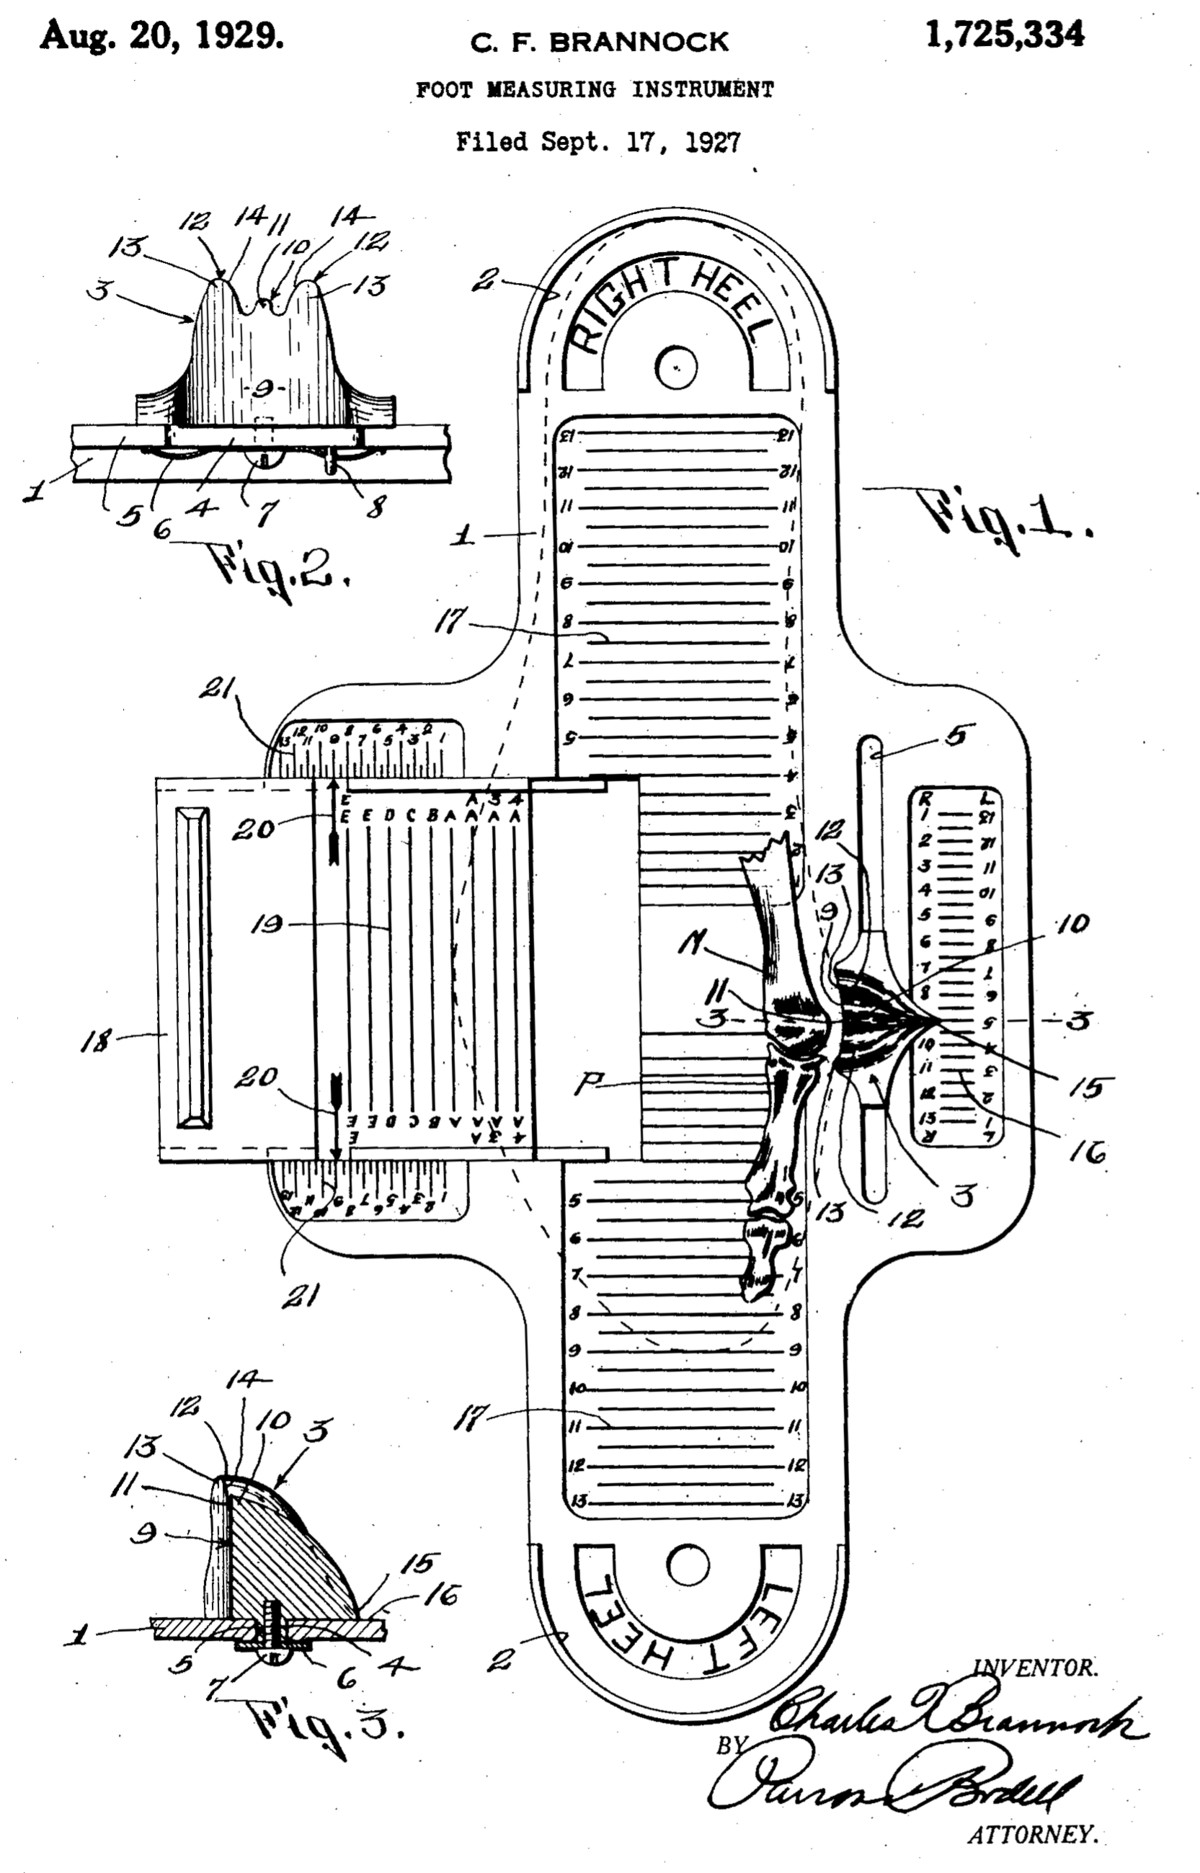 Printable Shoe Size Chart Brannock Device